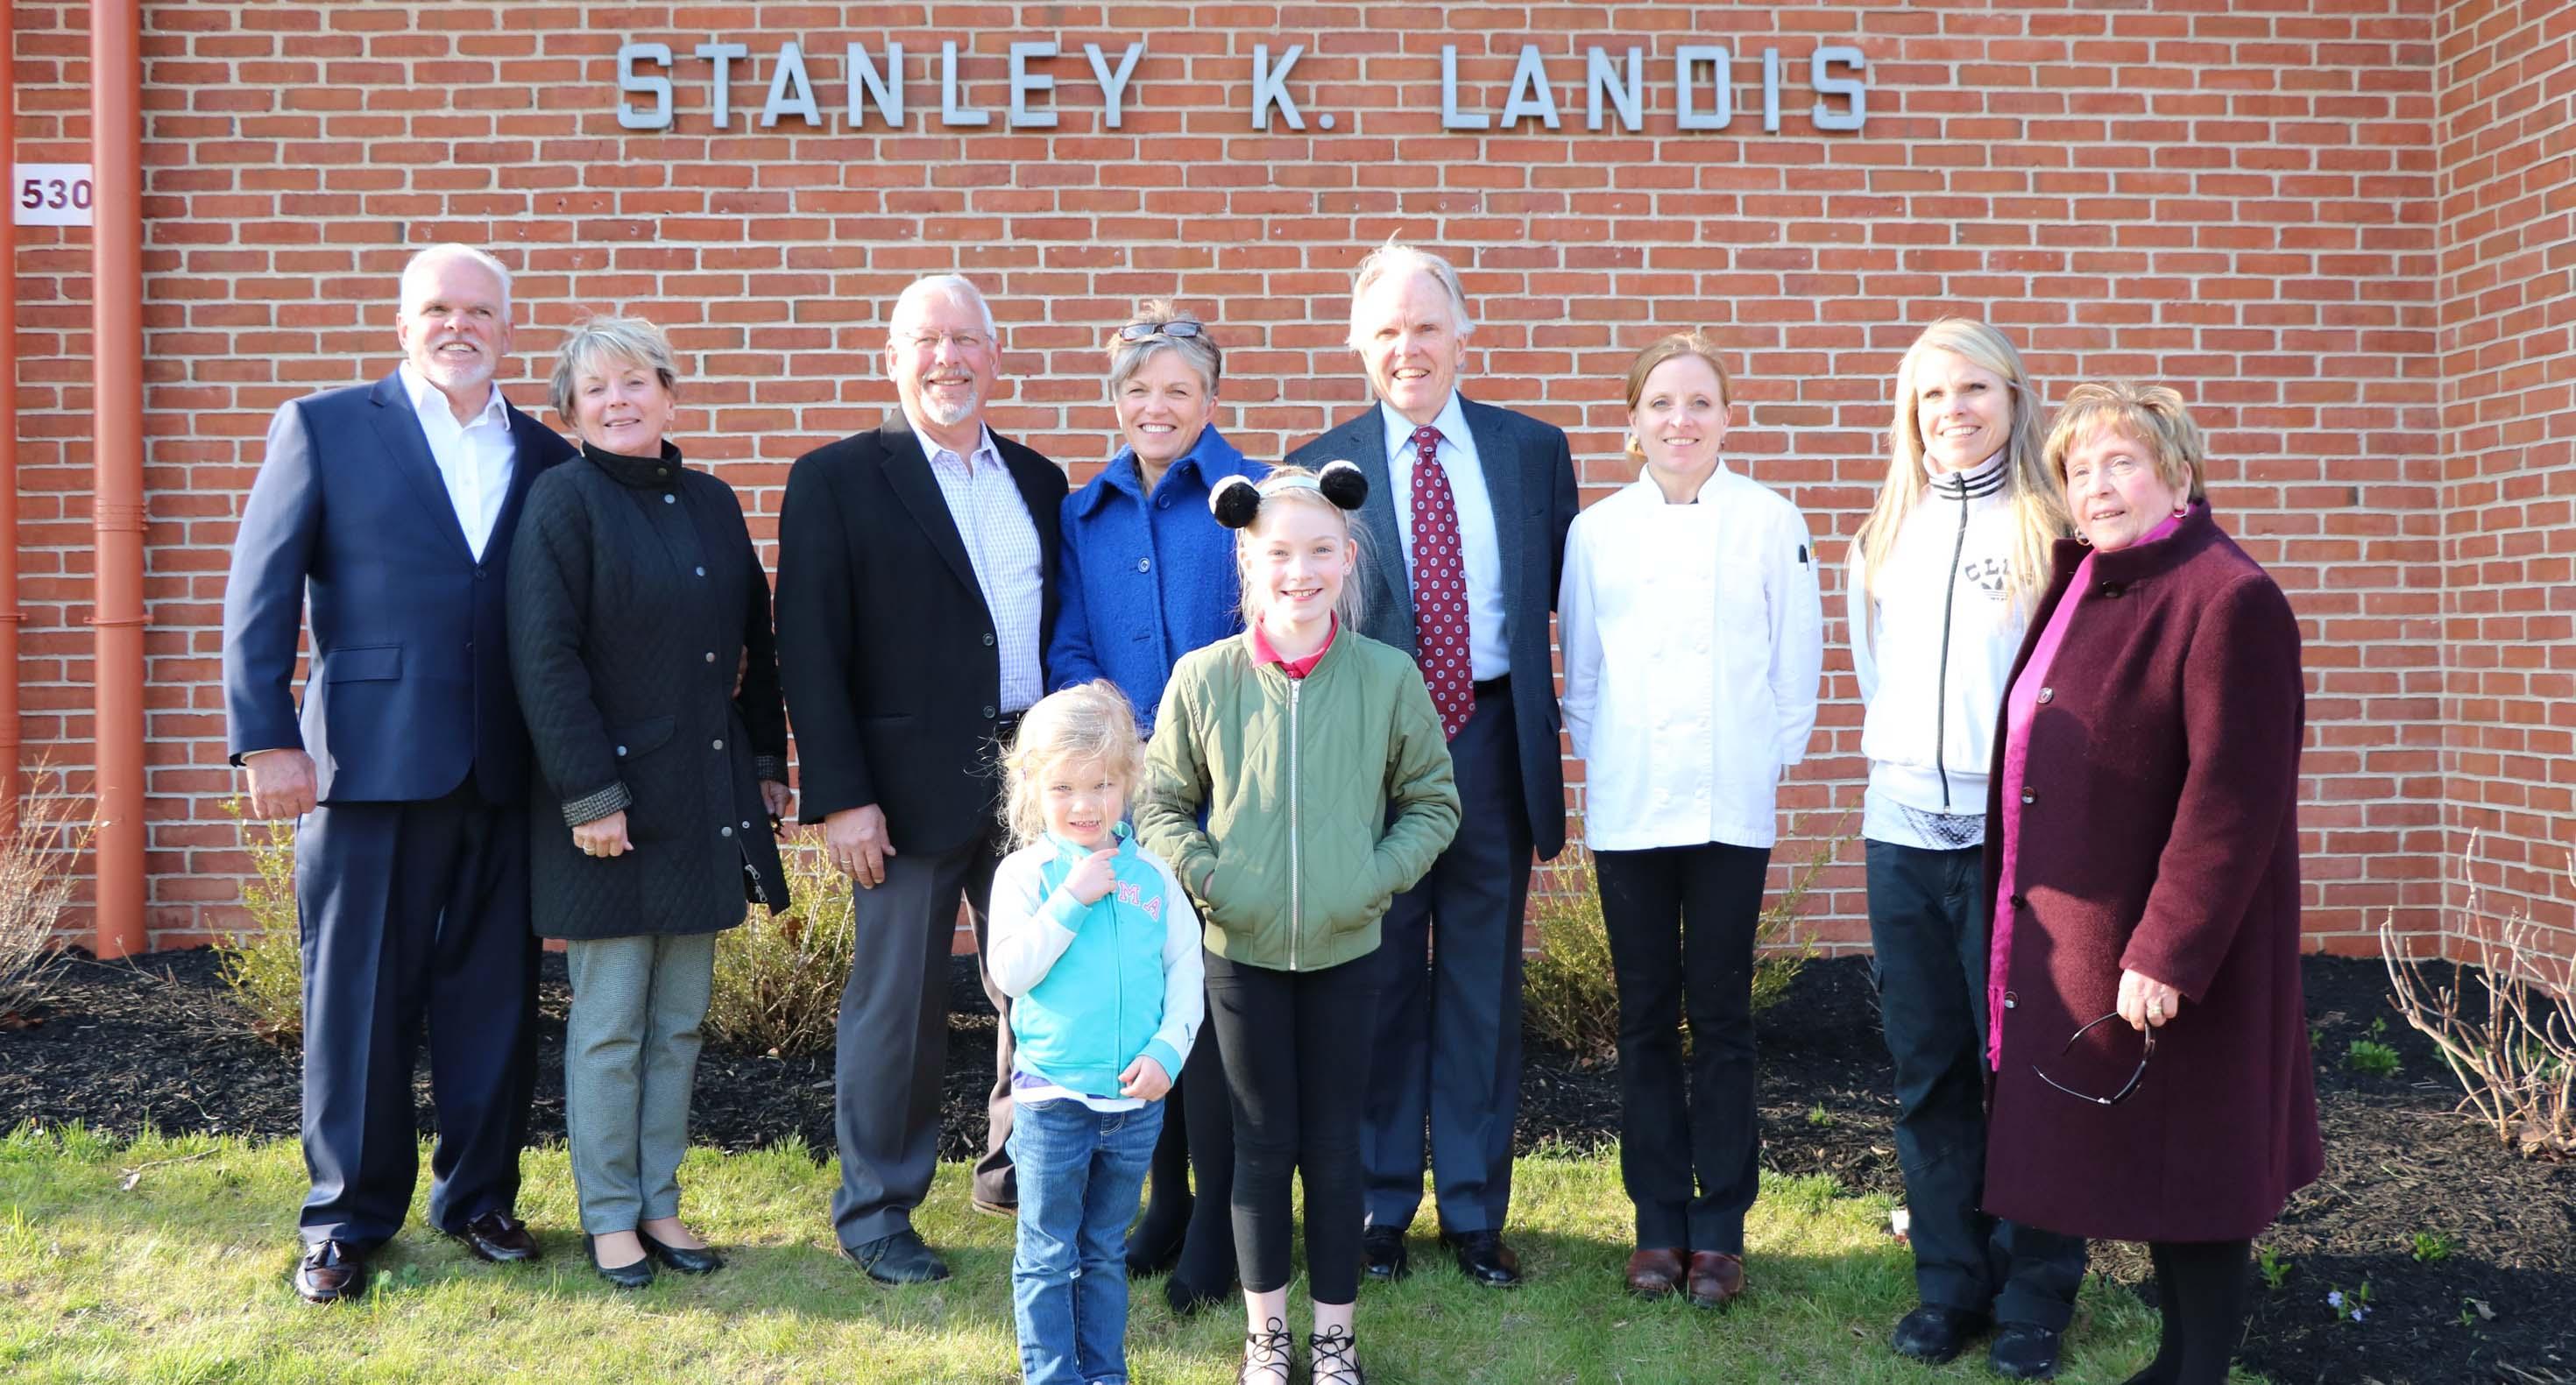 Legacy, Partnership Celebrated at Rededication Ceremony of CCIU's Stanley K. Landis Building